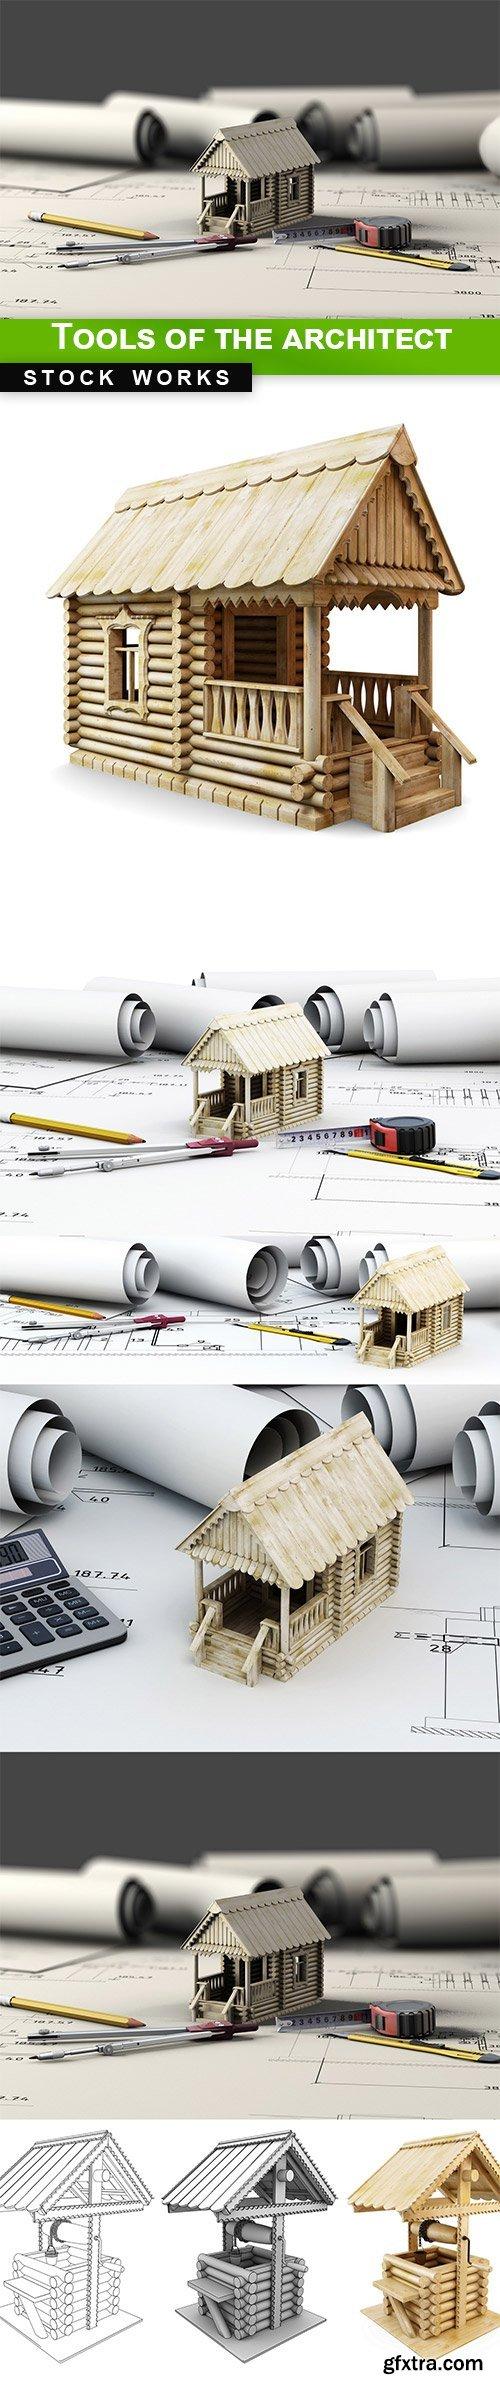 Tools of the architect - 6 UHQ JPEG